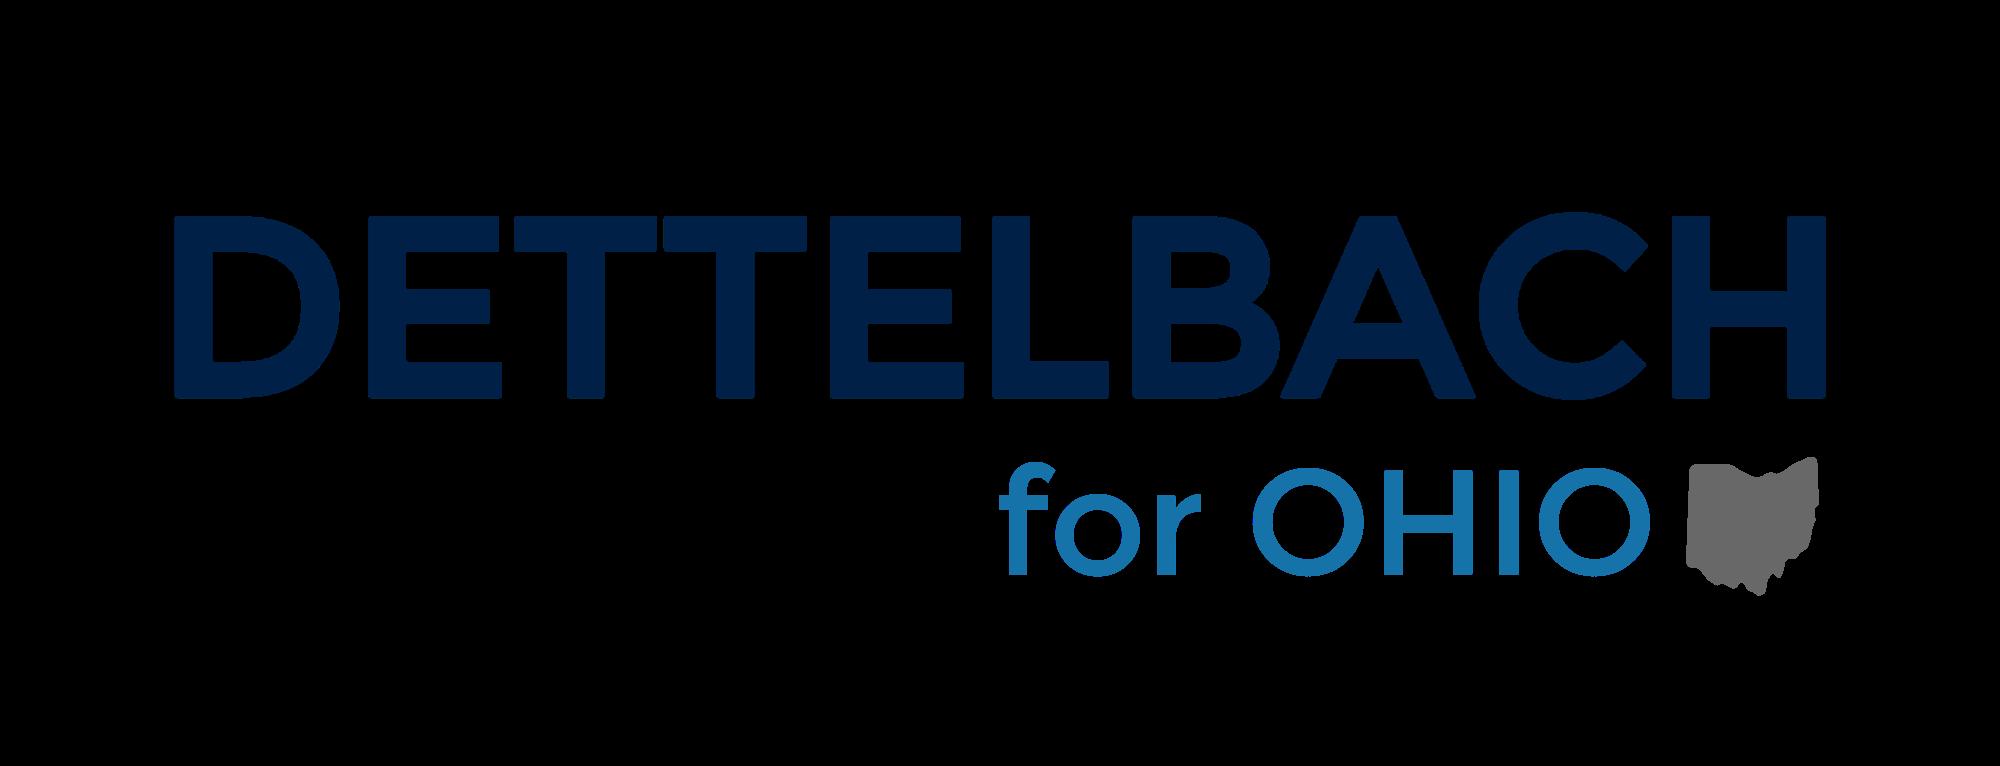 DETTELBACH-logo.png